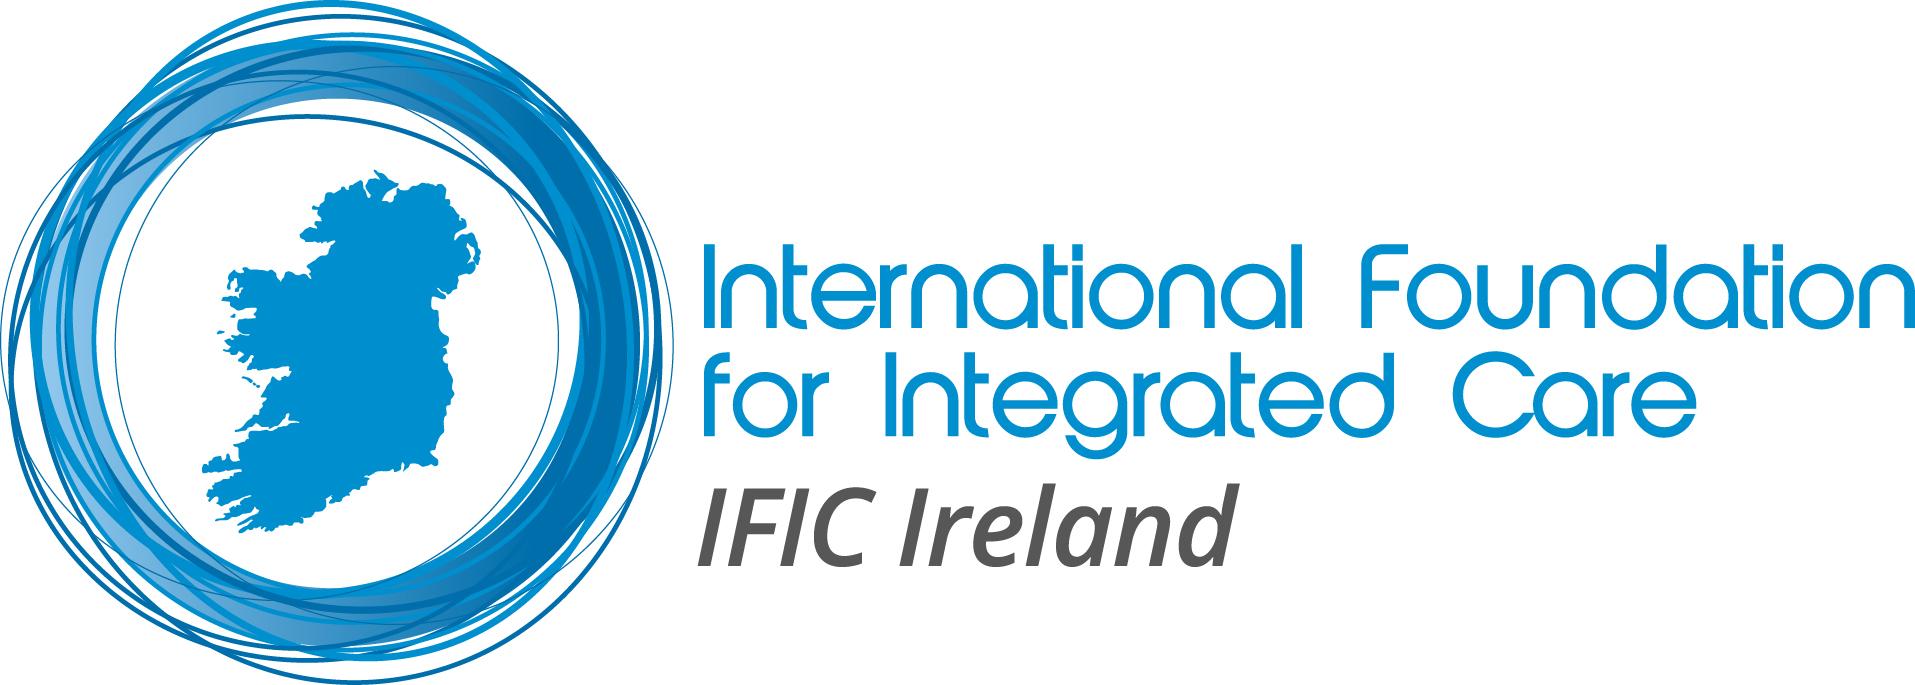 Visit IFIC Ireland